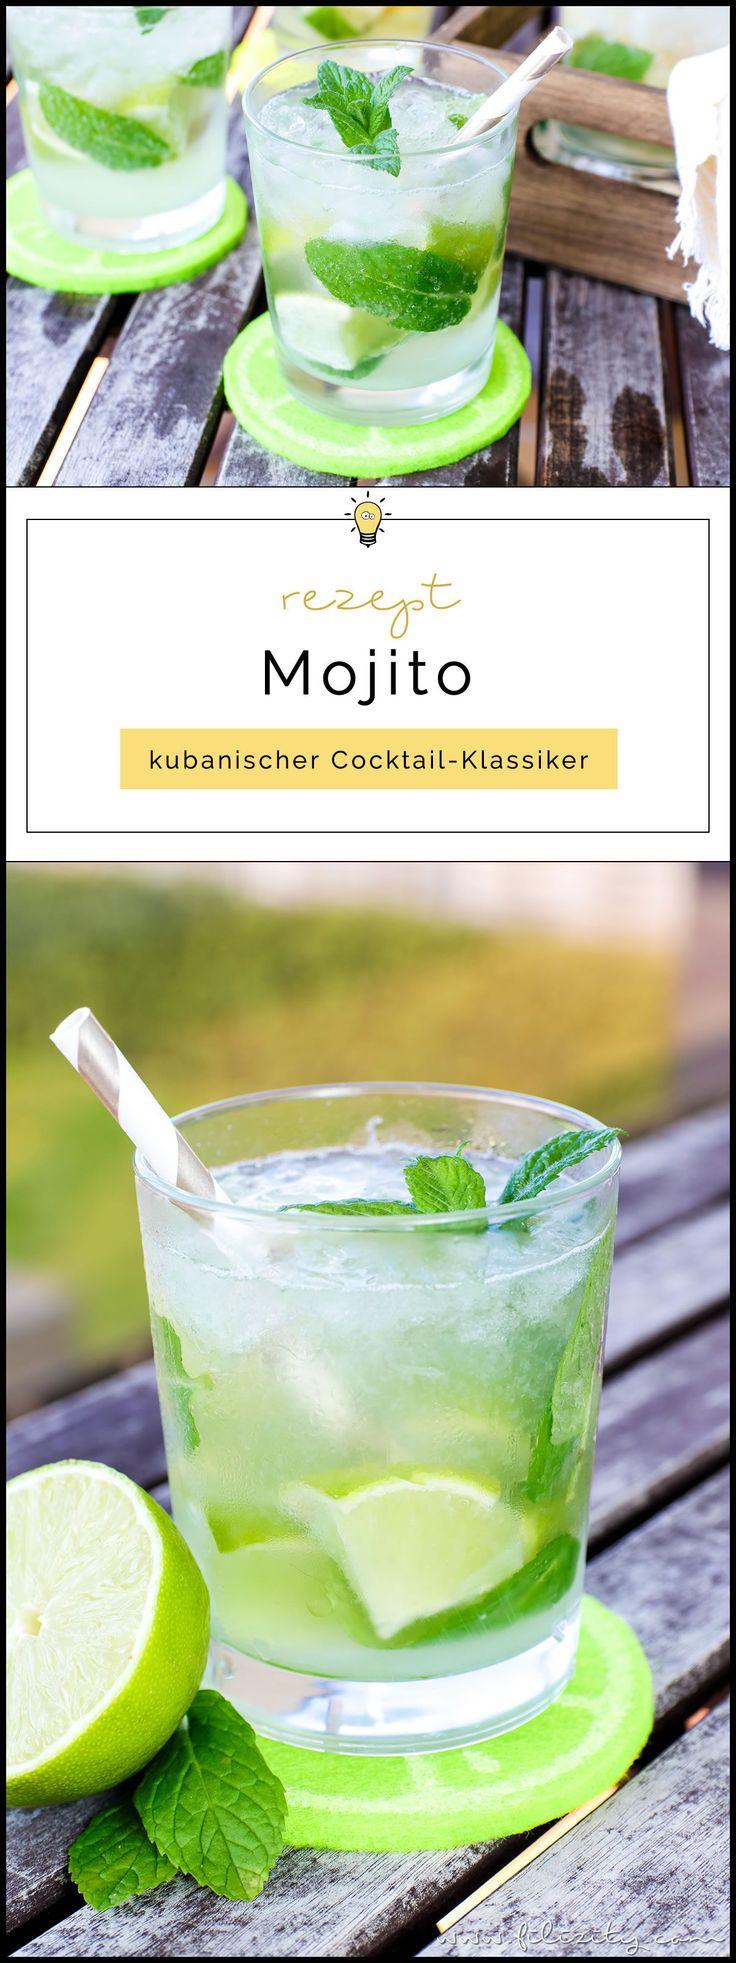 Mojito Rezept – Kubanischer Cocktail-Klassiker – Filizity. – Rezepte & DIY Ideen: Basteln, Geschenkideen, Deko, Beauty, Fashion & Wohnen